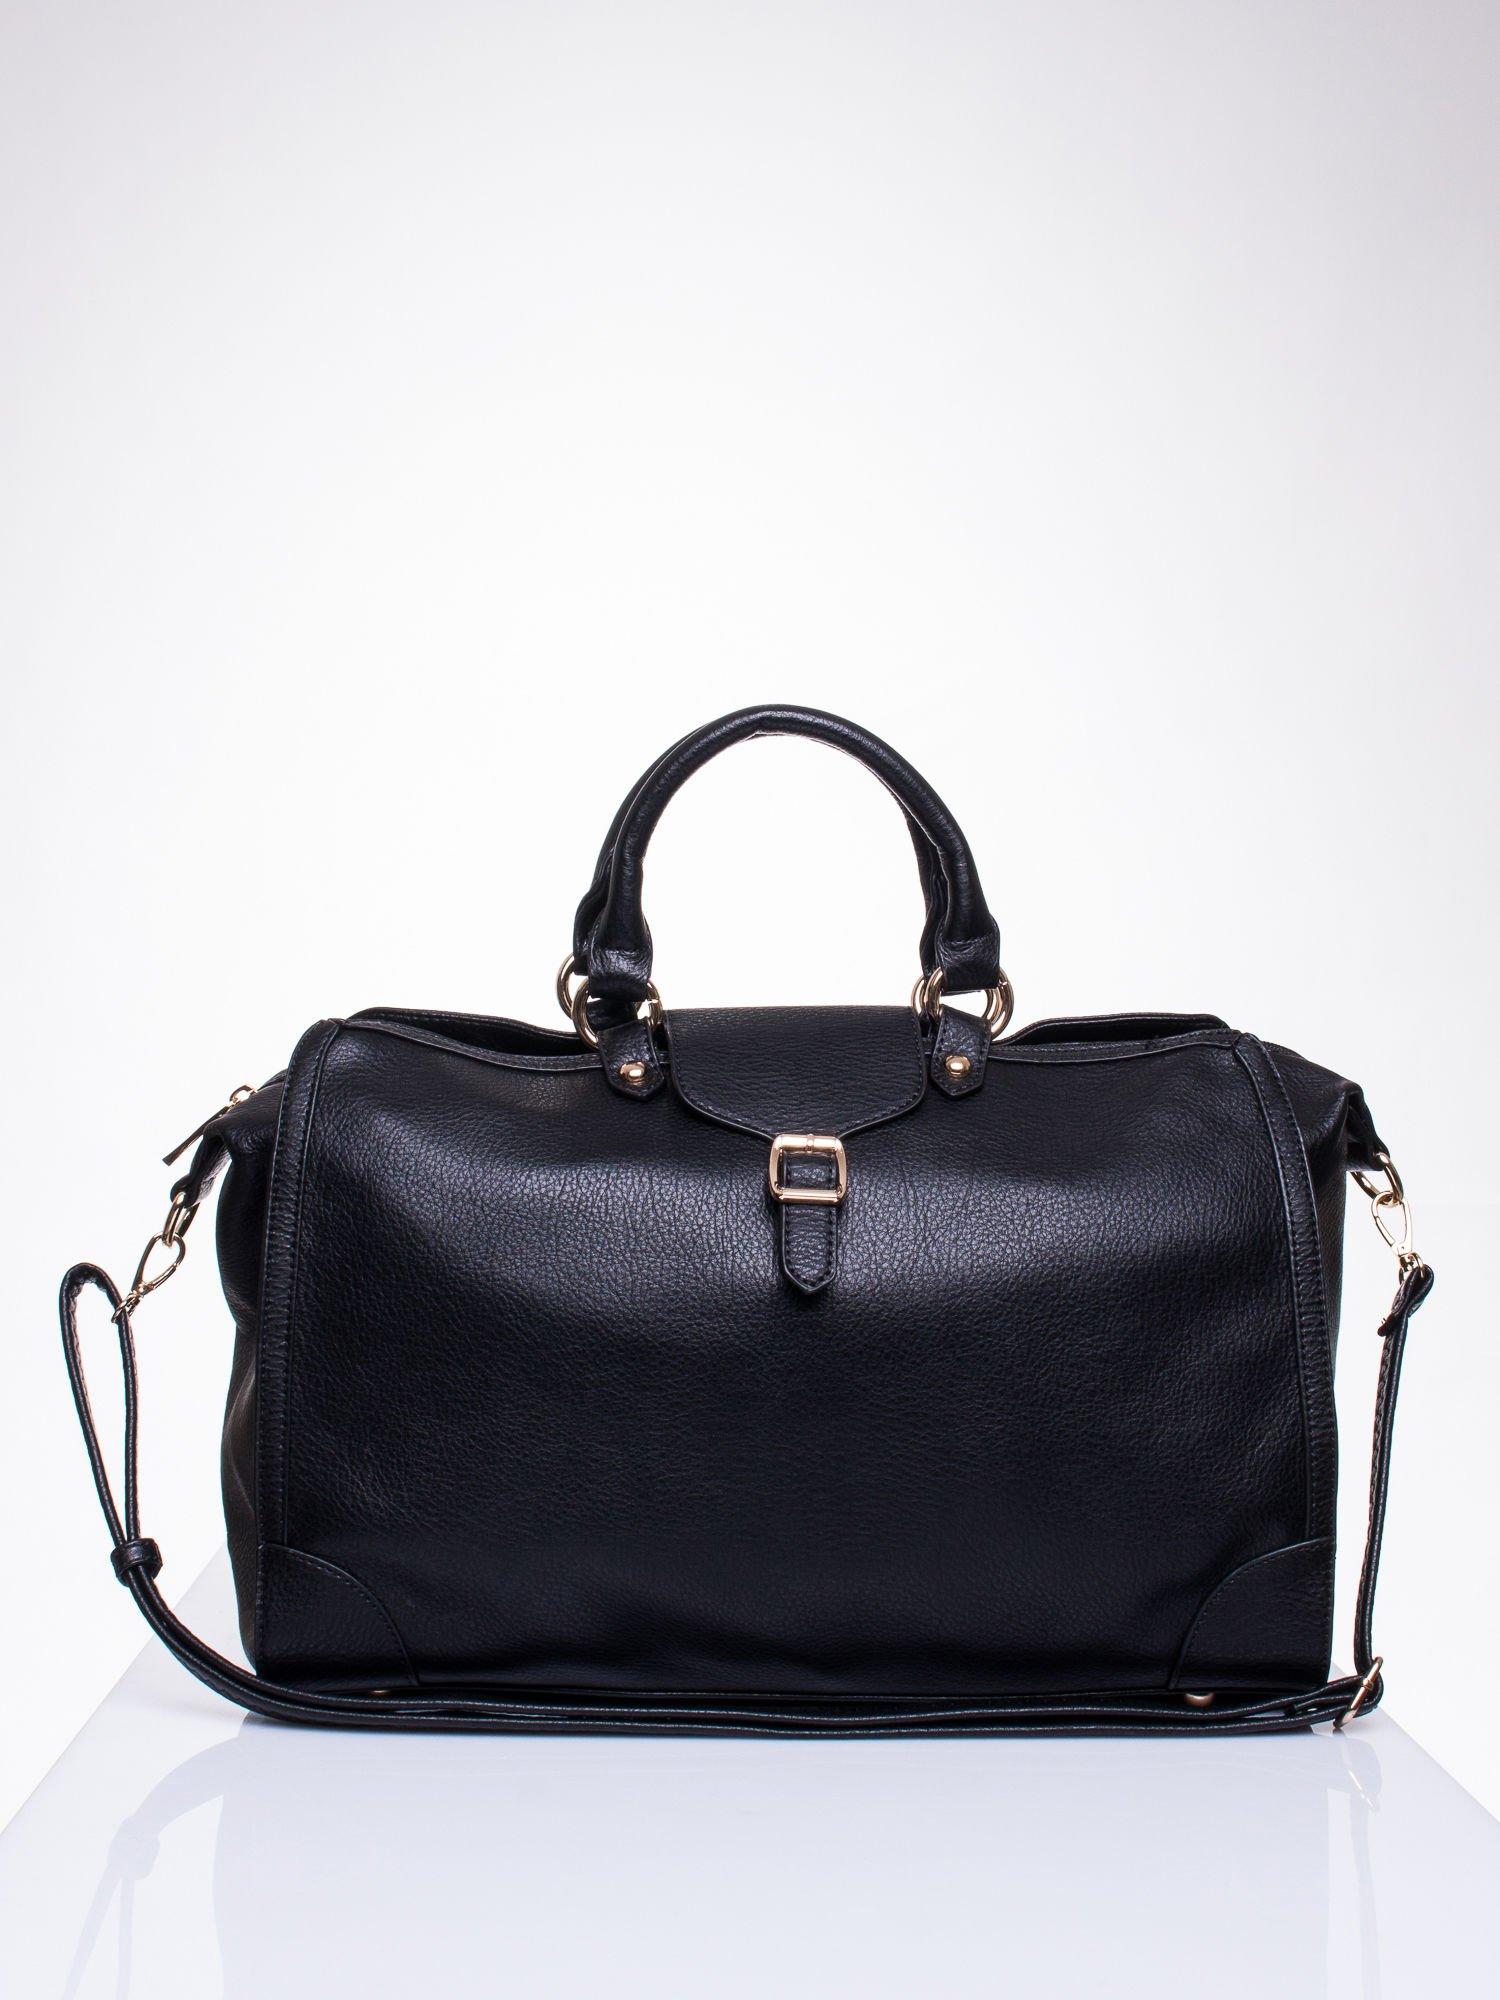 Czarna torba kuferek z klapką                                  zdj.                                  1